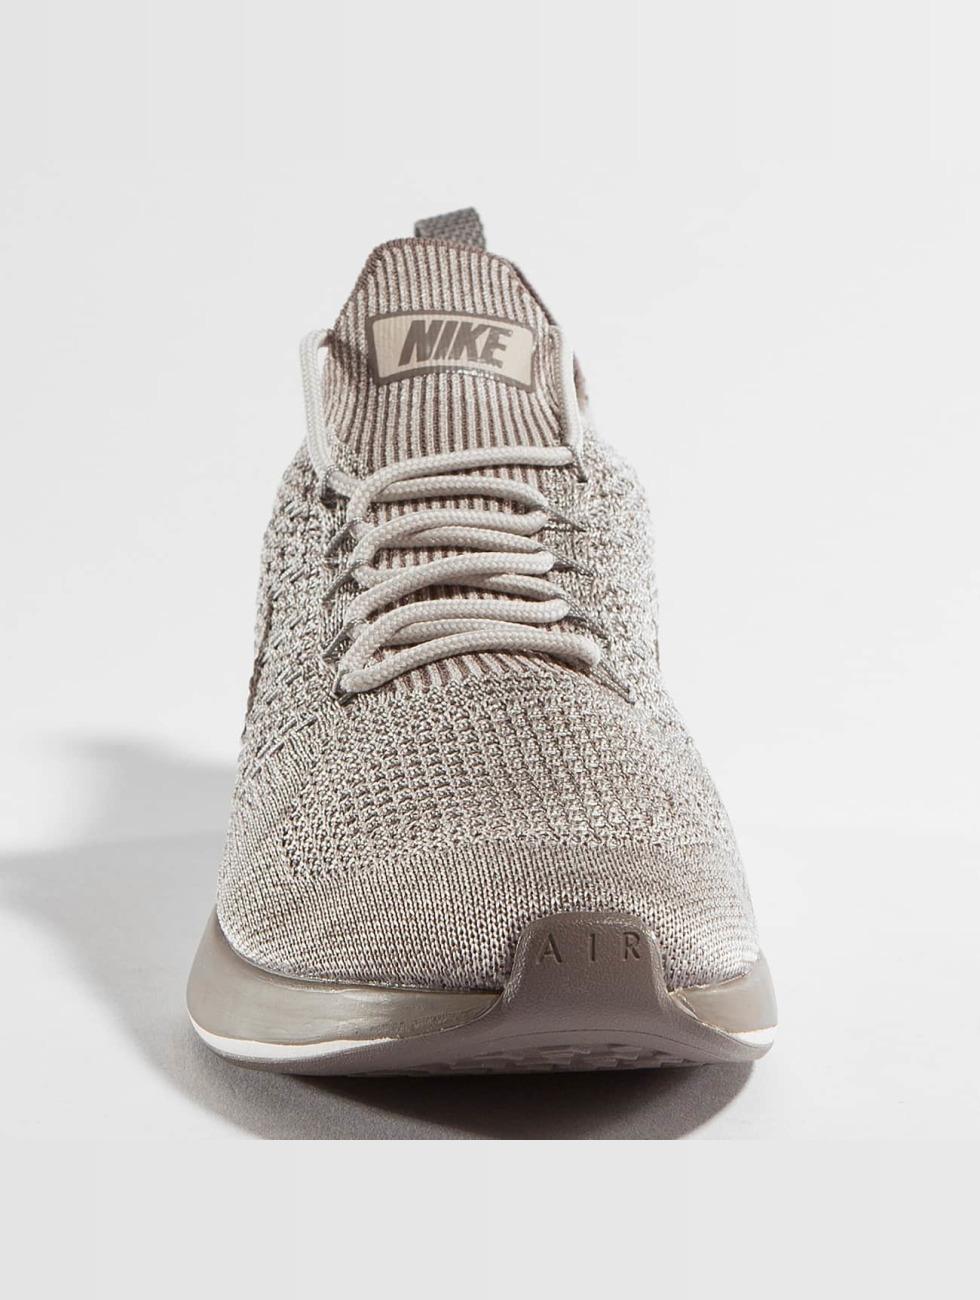 Nike Pattino / Sneaker Zoom Aria Mariah Corridore Flyknit In Grigio 363 258 apmTszjT